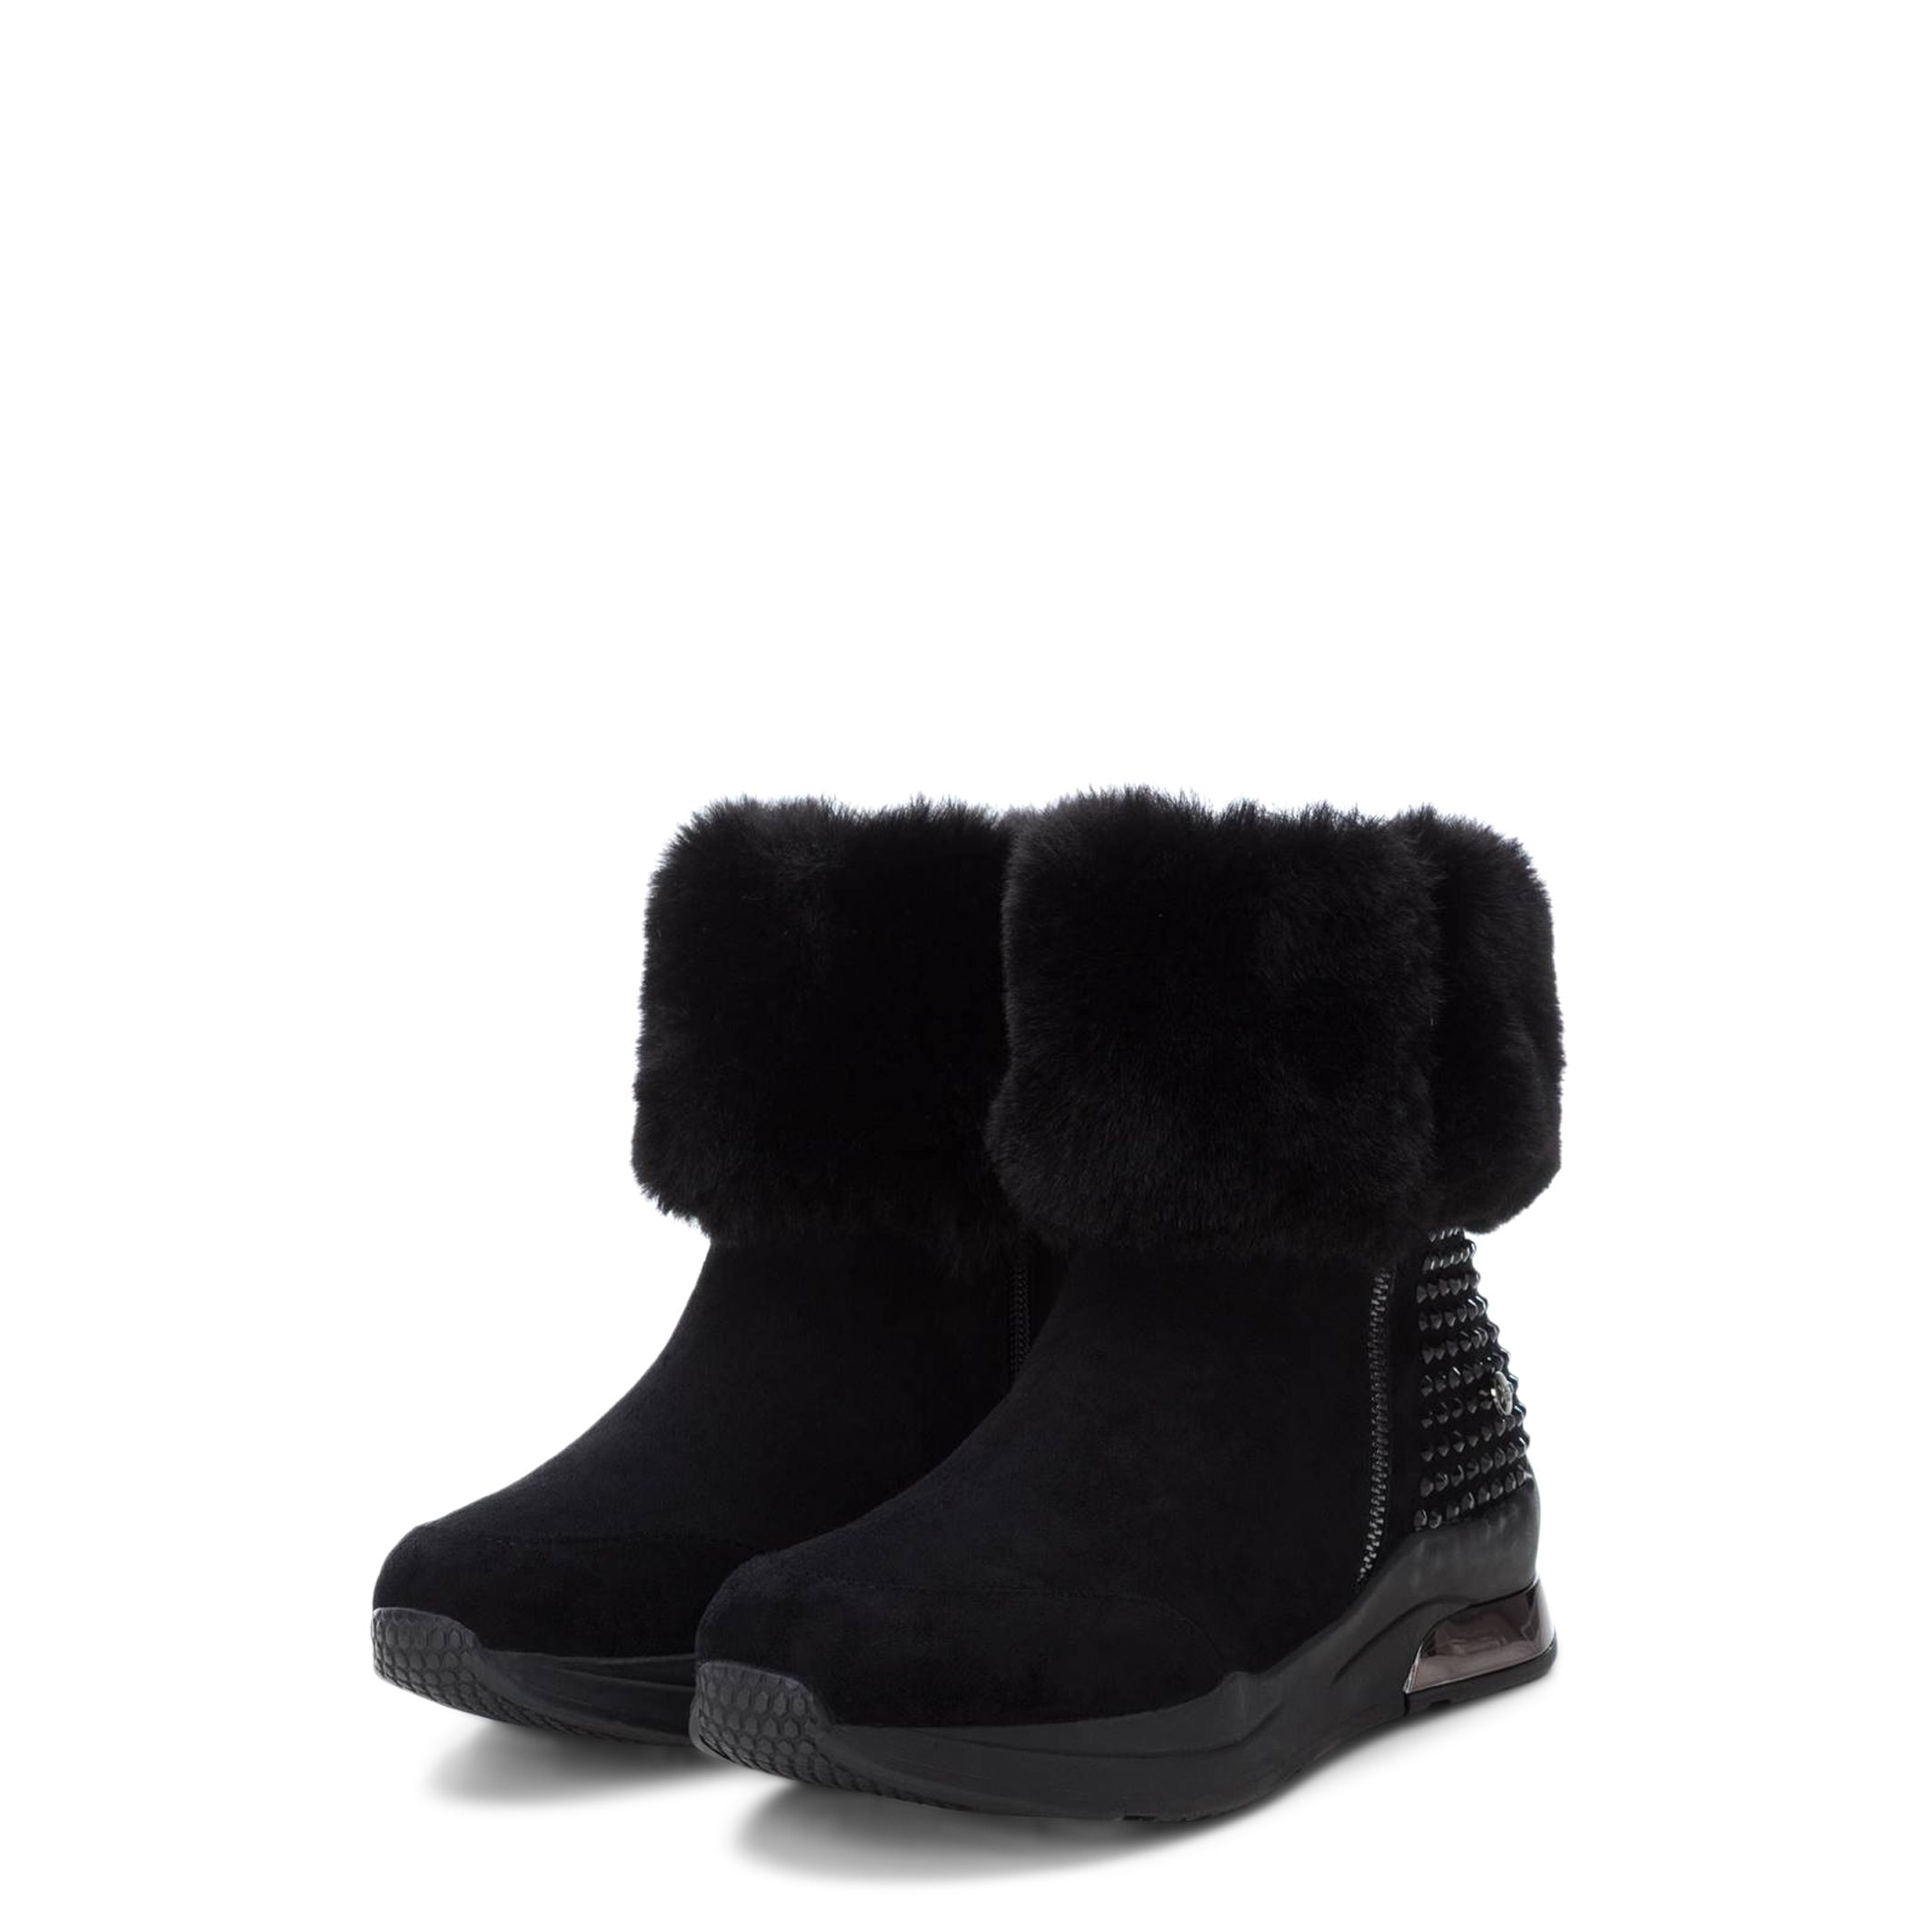 Schuhe Xti – 49467 – Schwarz